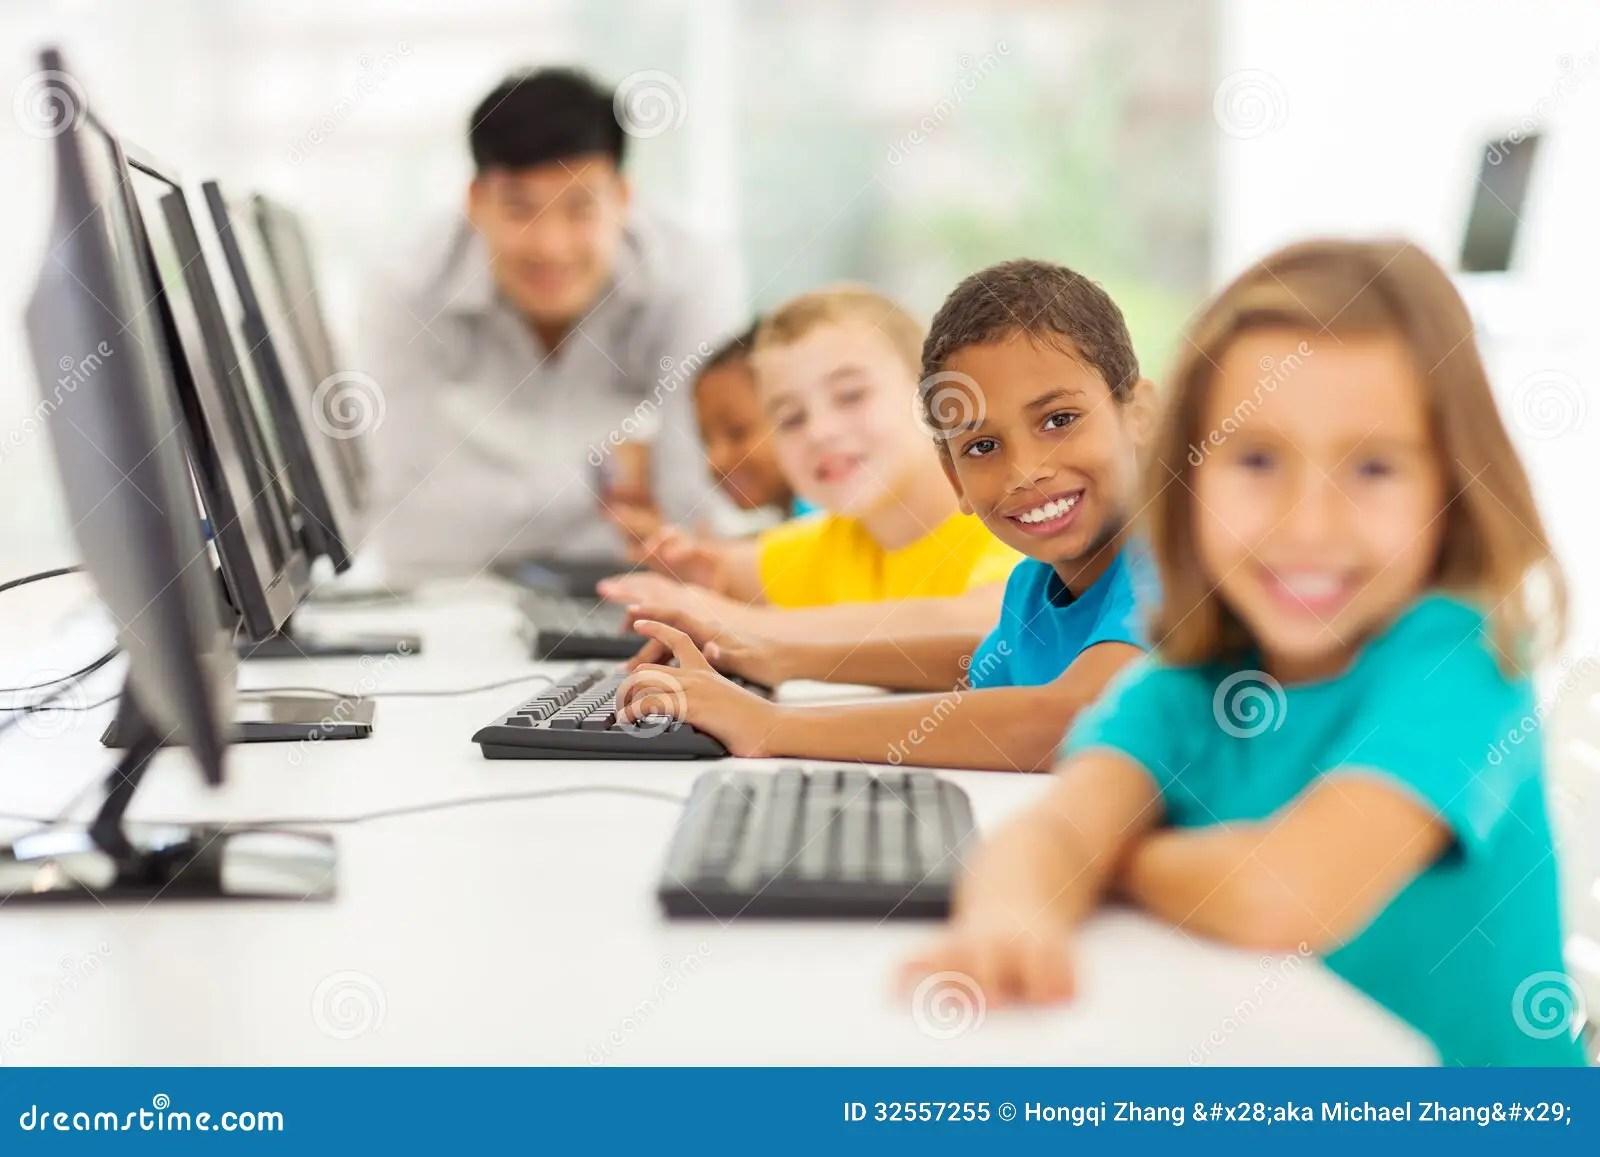 Children Computer Class Stock Image Image Of Cheerful